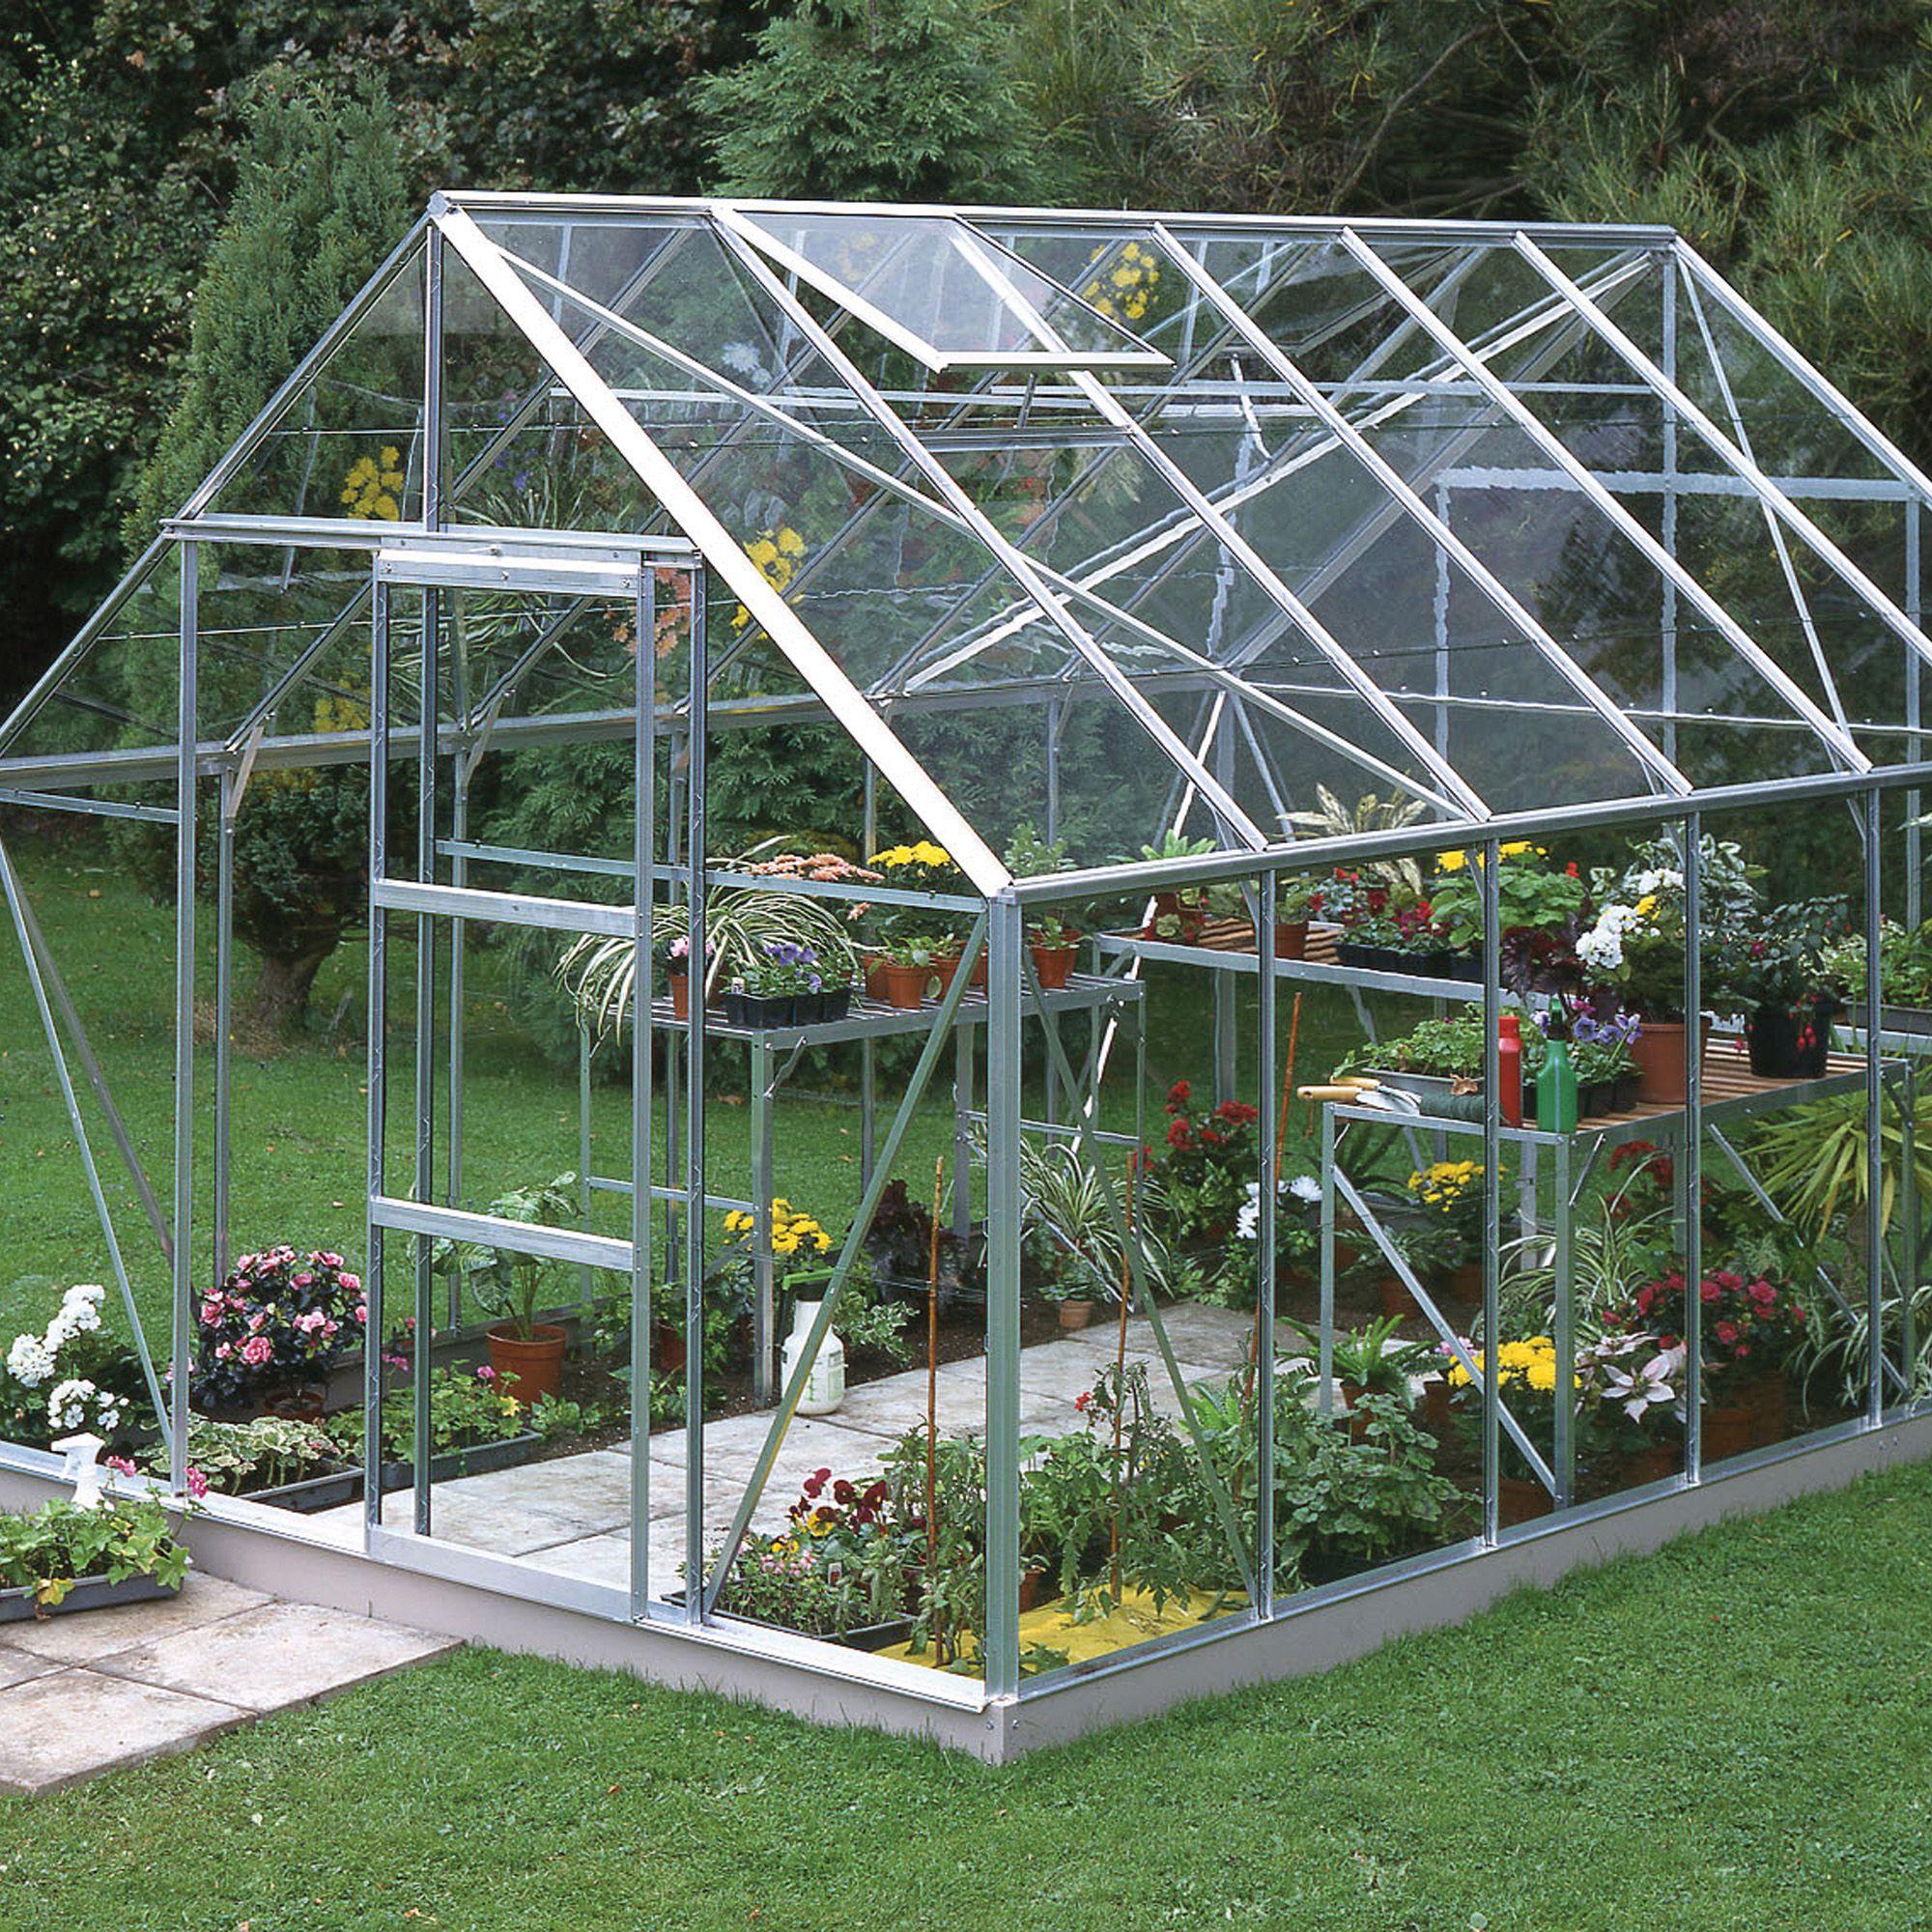 Window Greenhouse Insert Kitchen Window Greenhouses: B&Q Premier Metal 6x4 Toughened Safety Glass Greenhouse